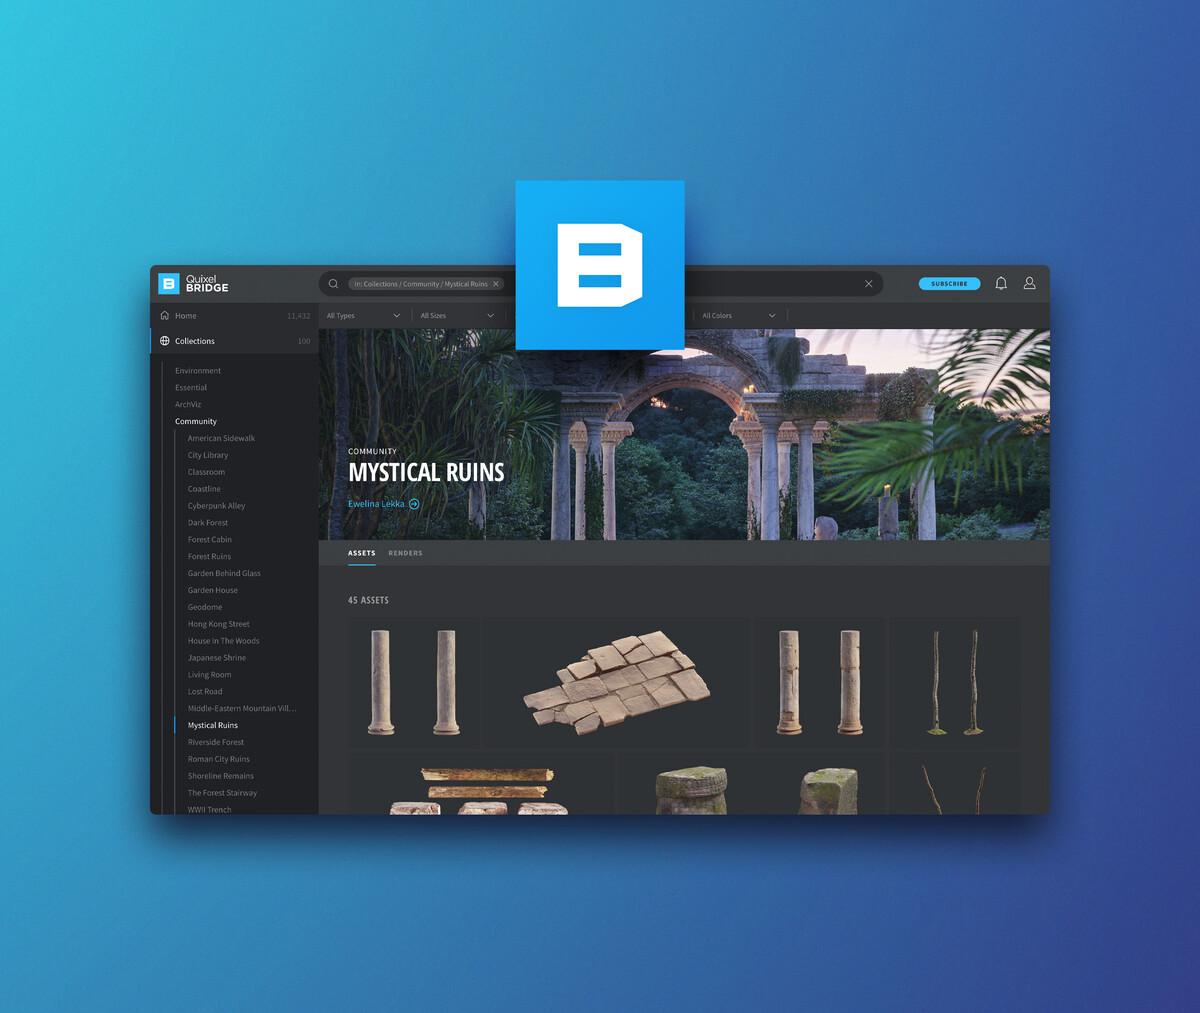 bridge-product-page-image-1.jpg